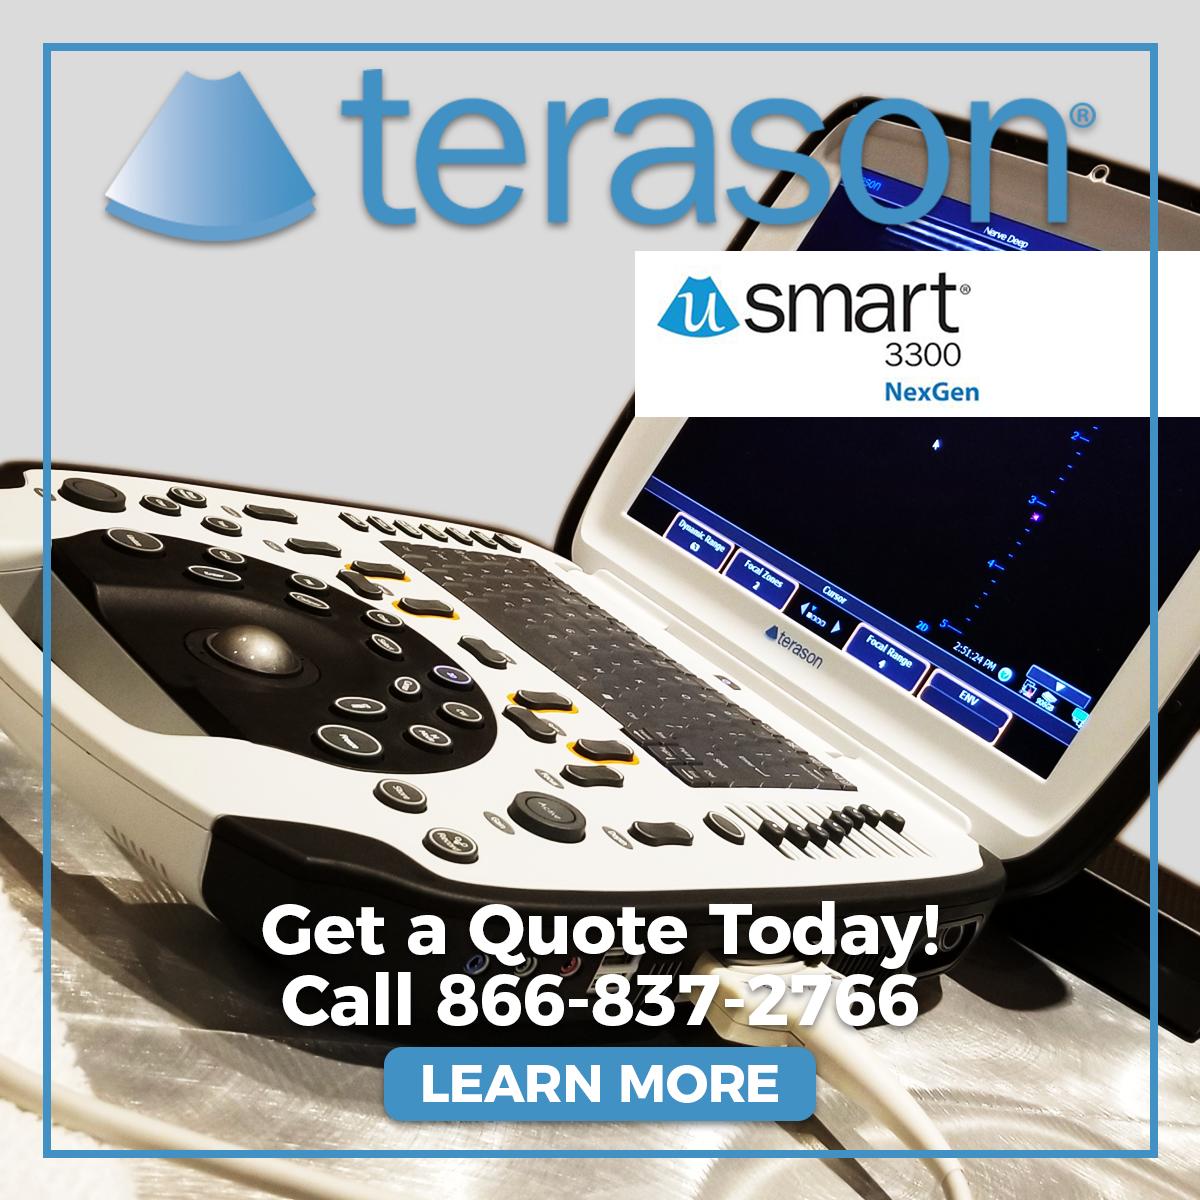 Copy of Terason Ultrasound